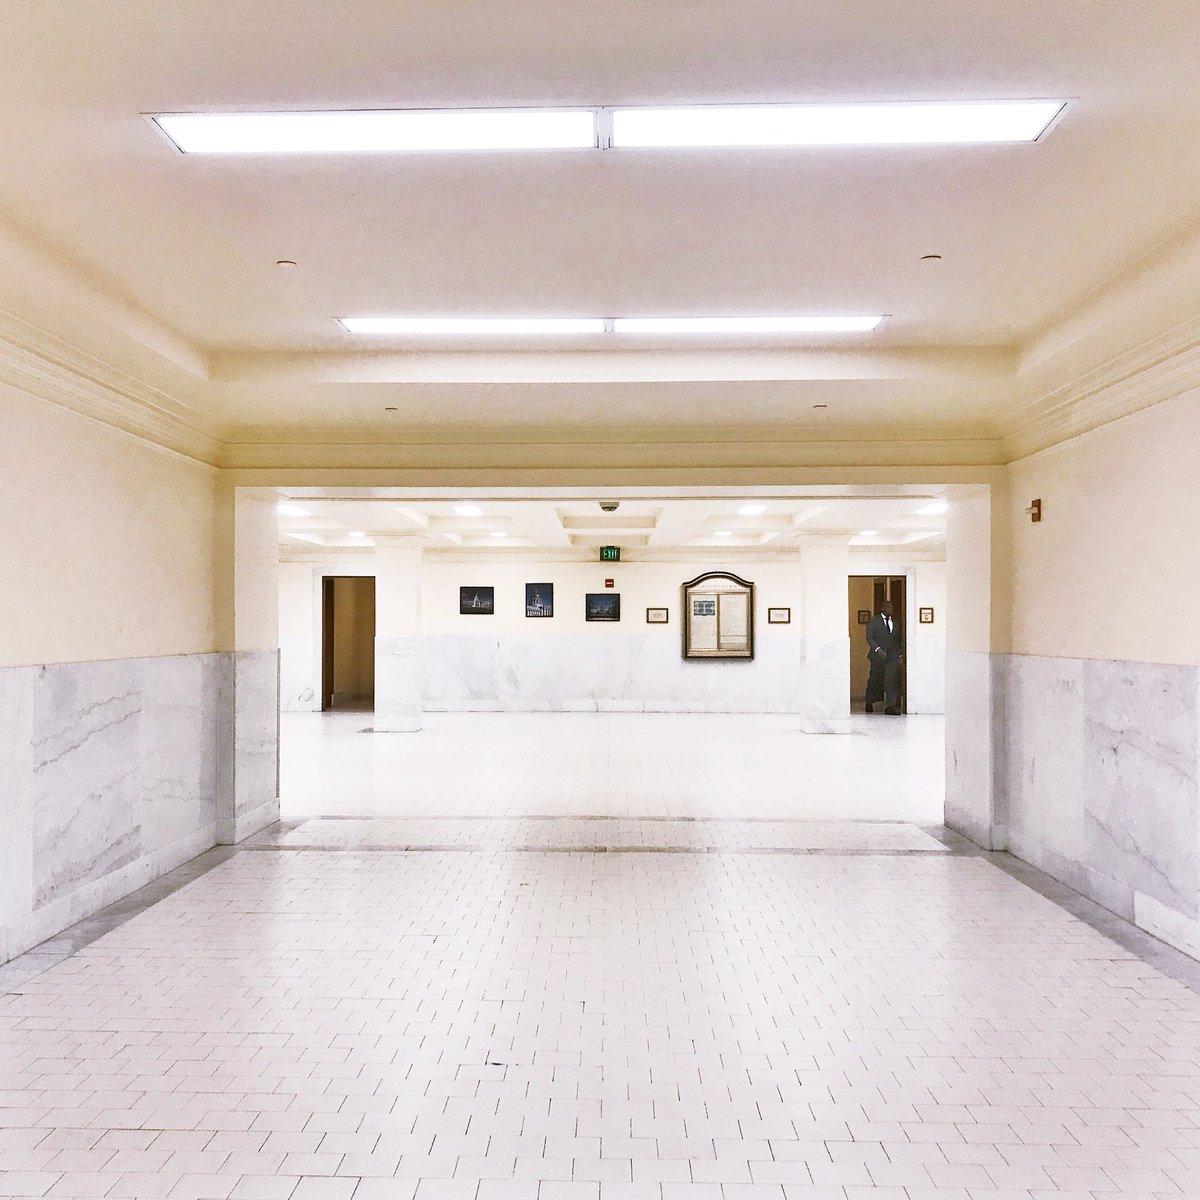 sf city hall sfcity hall twitter